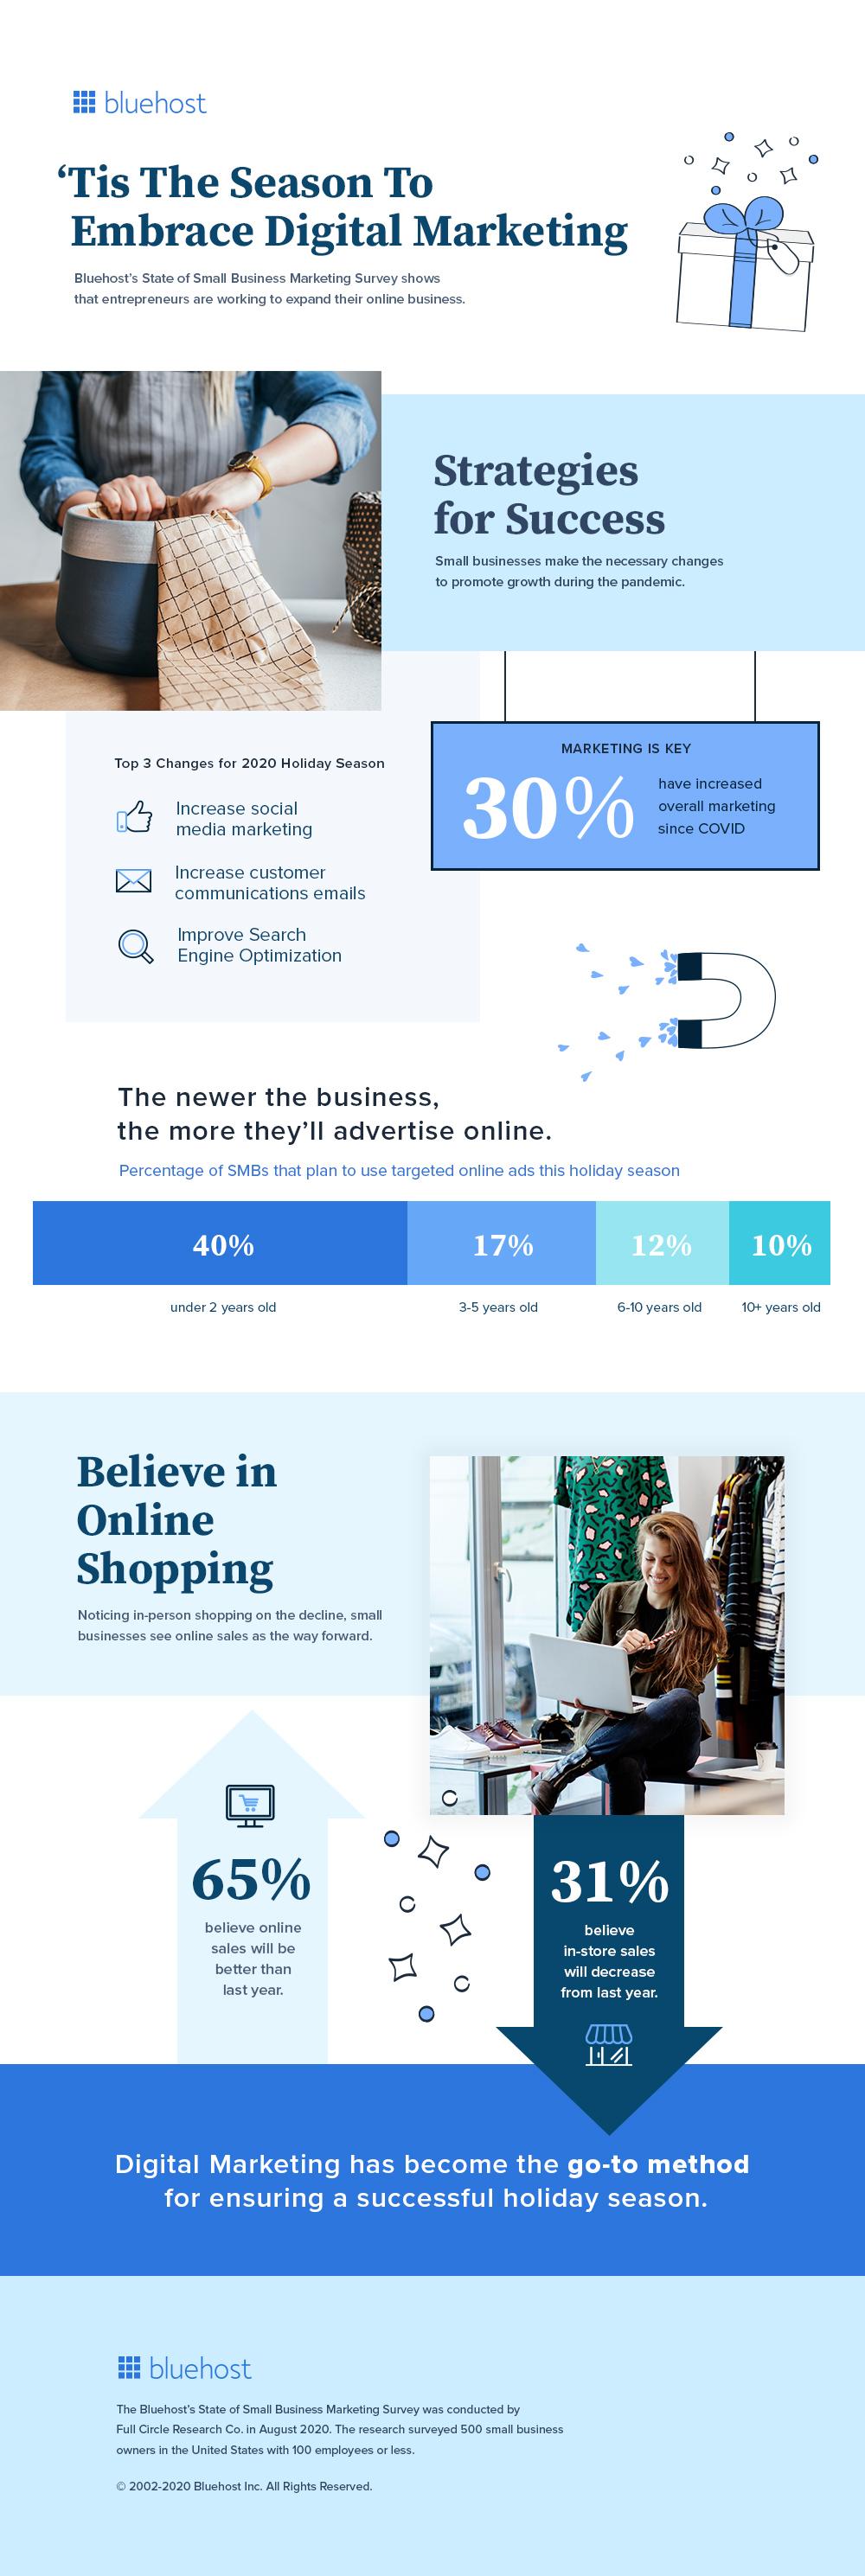 bluehost digital marketing